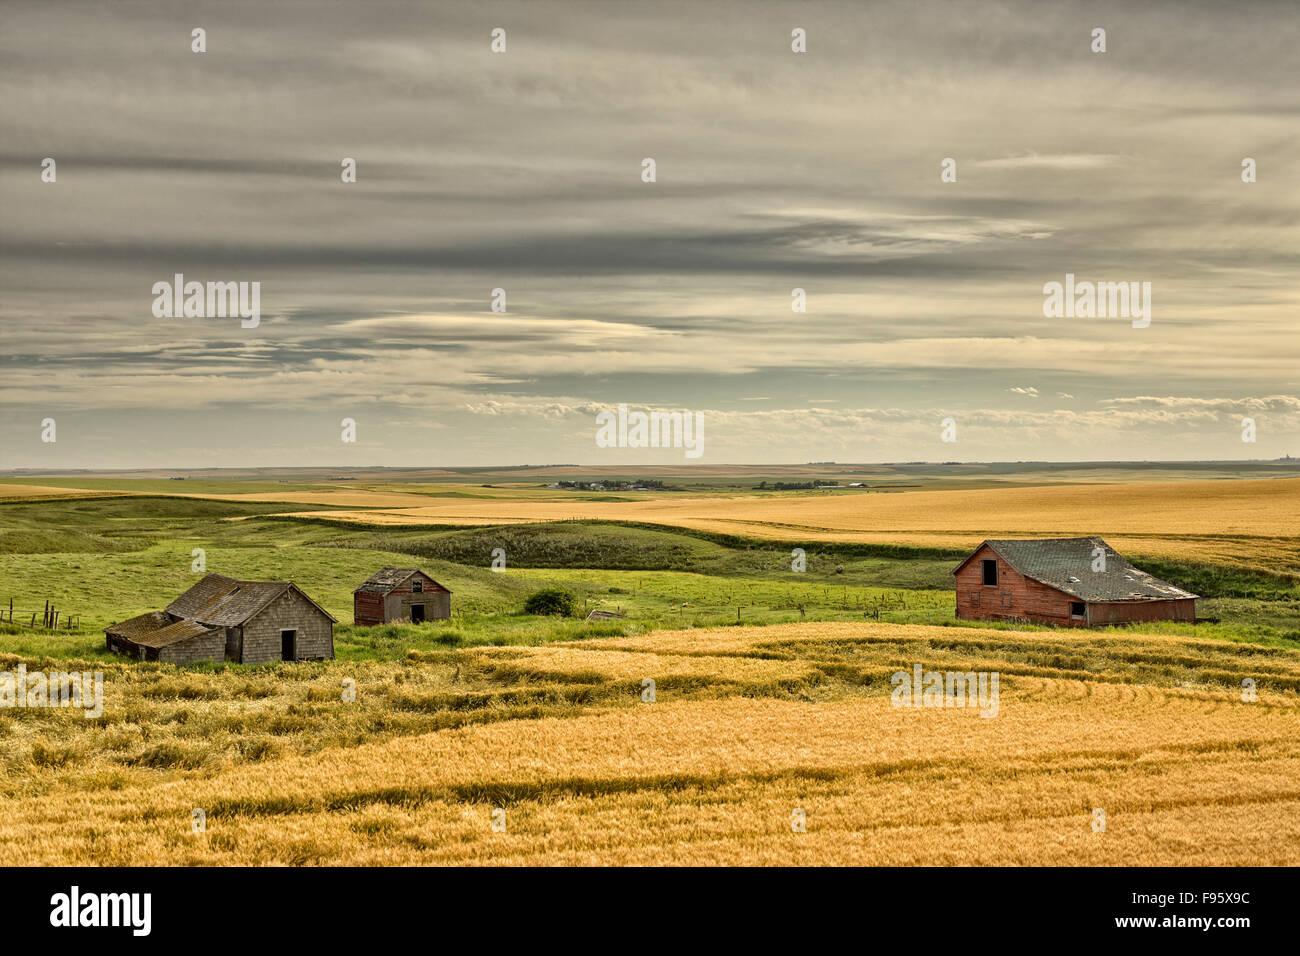 Old buidlings in barley cropland near Trochu, Alberta - Stock Image